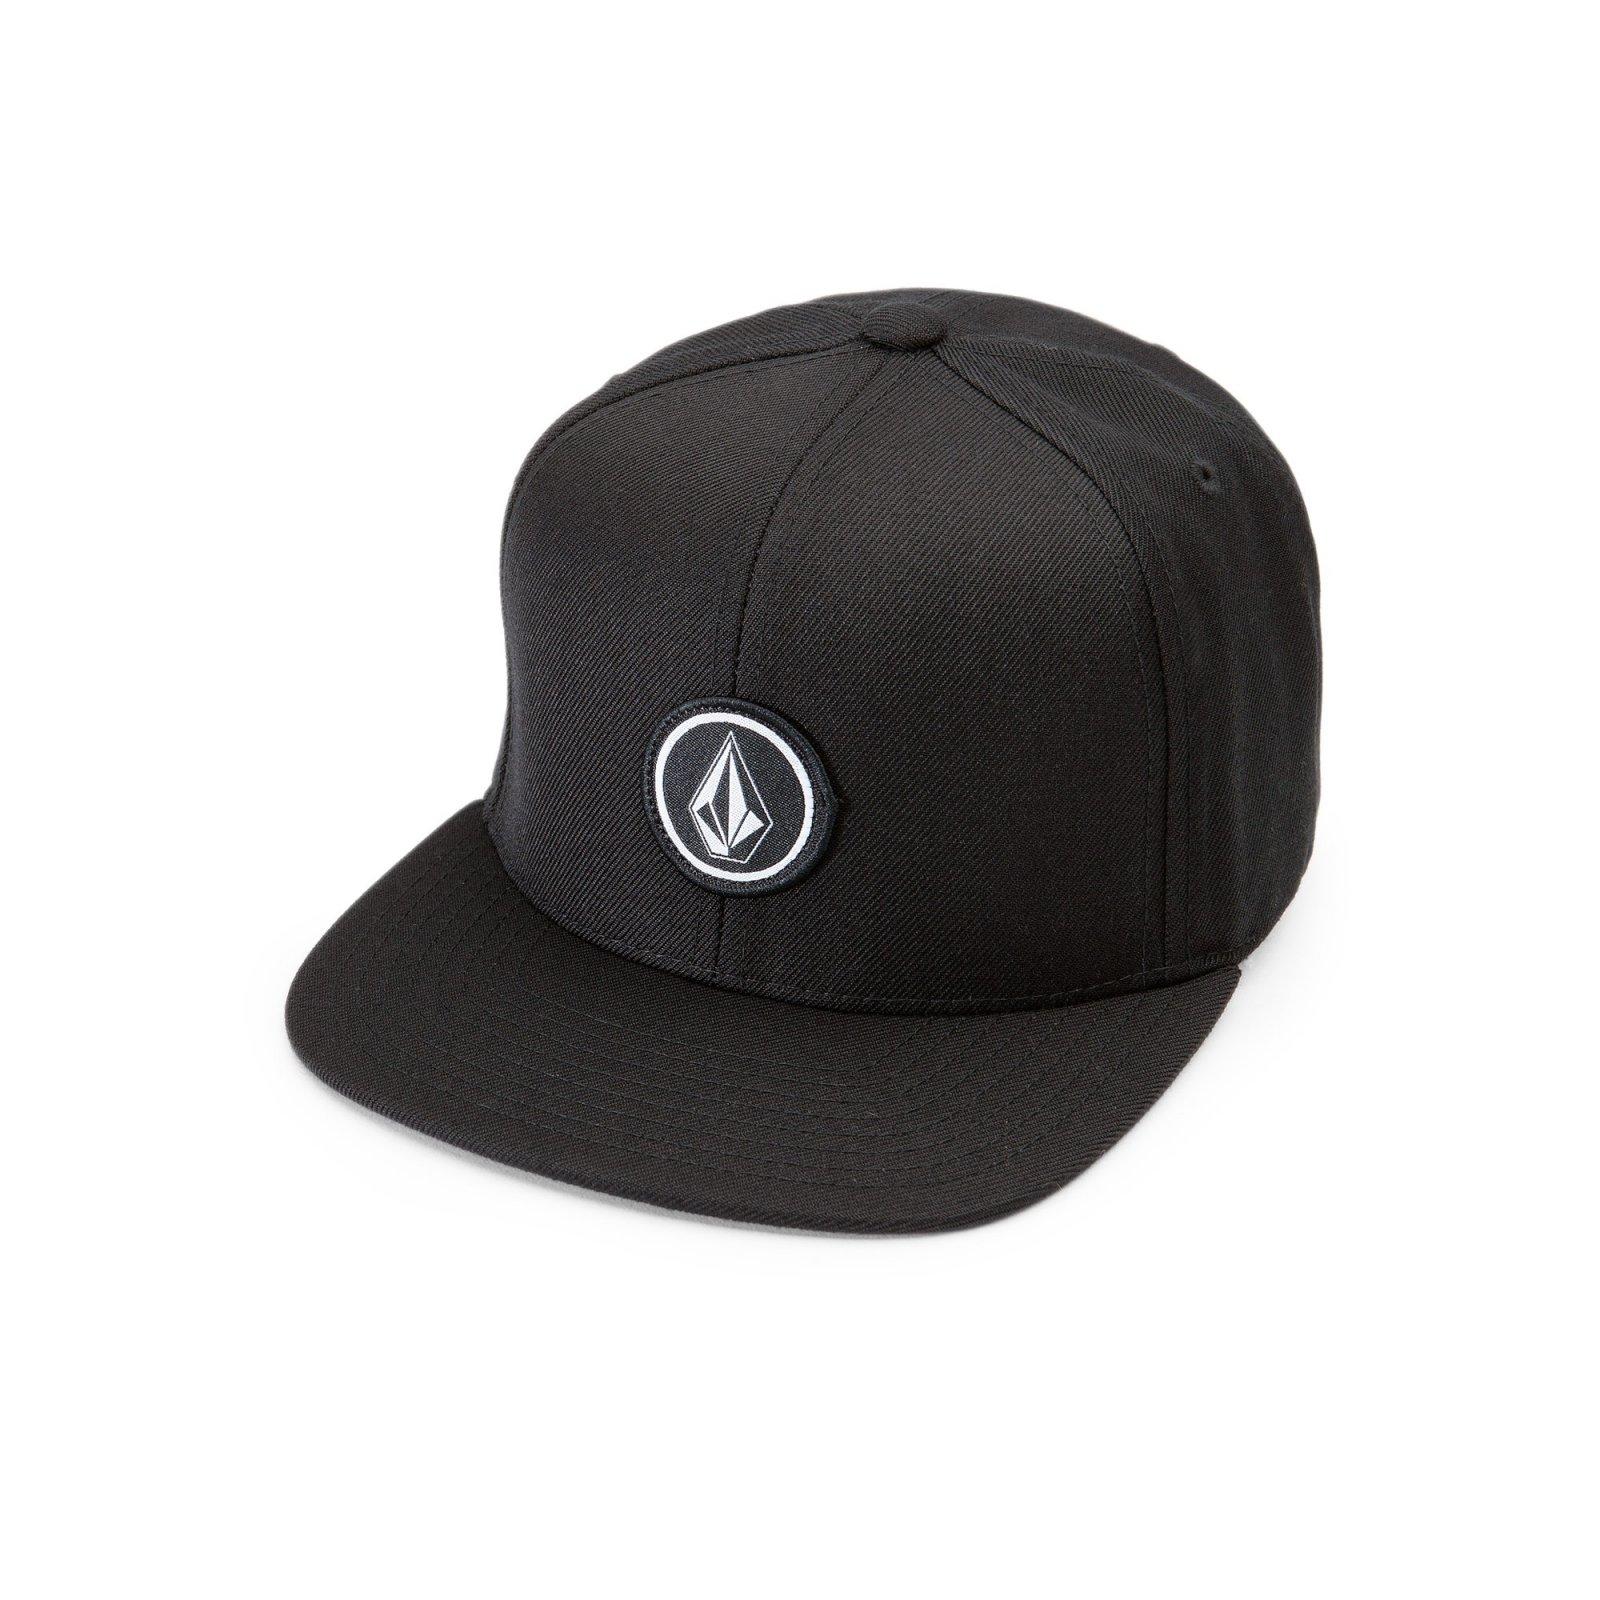 2bba7561292 Volcom Quarter Twill Snapback Hat - 886608247814